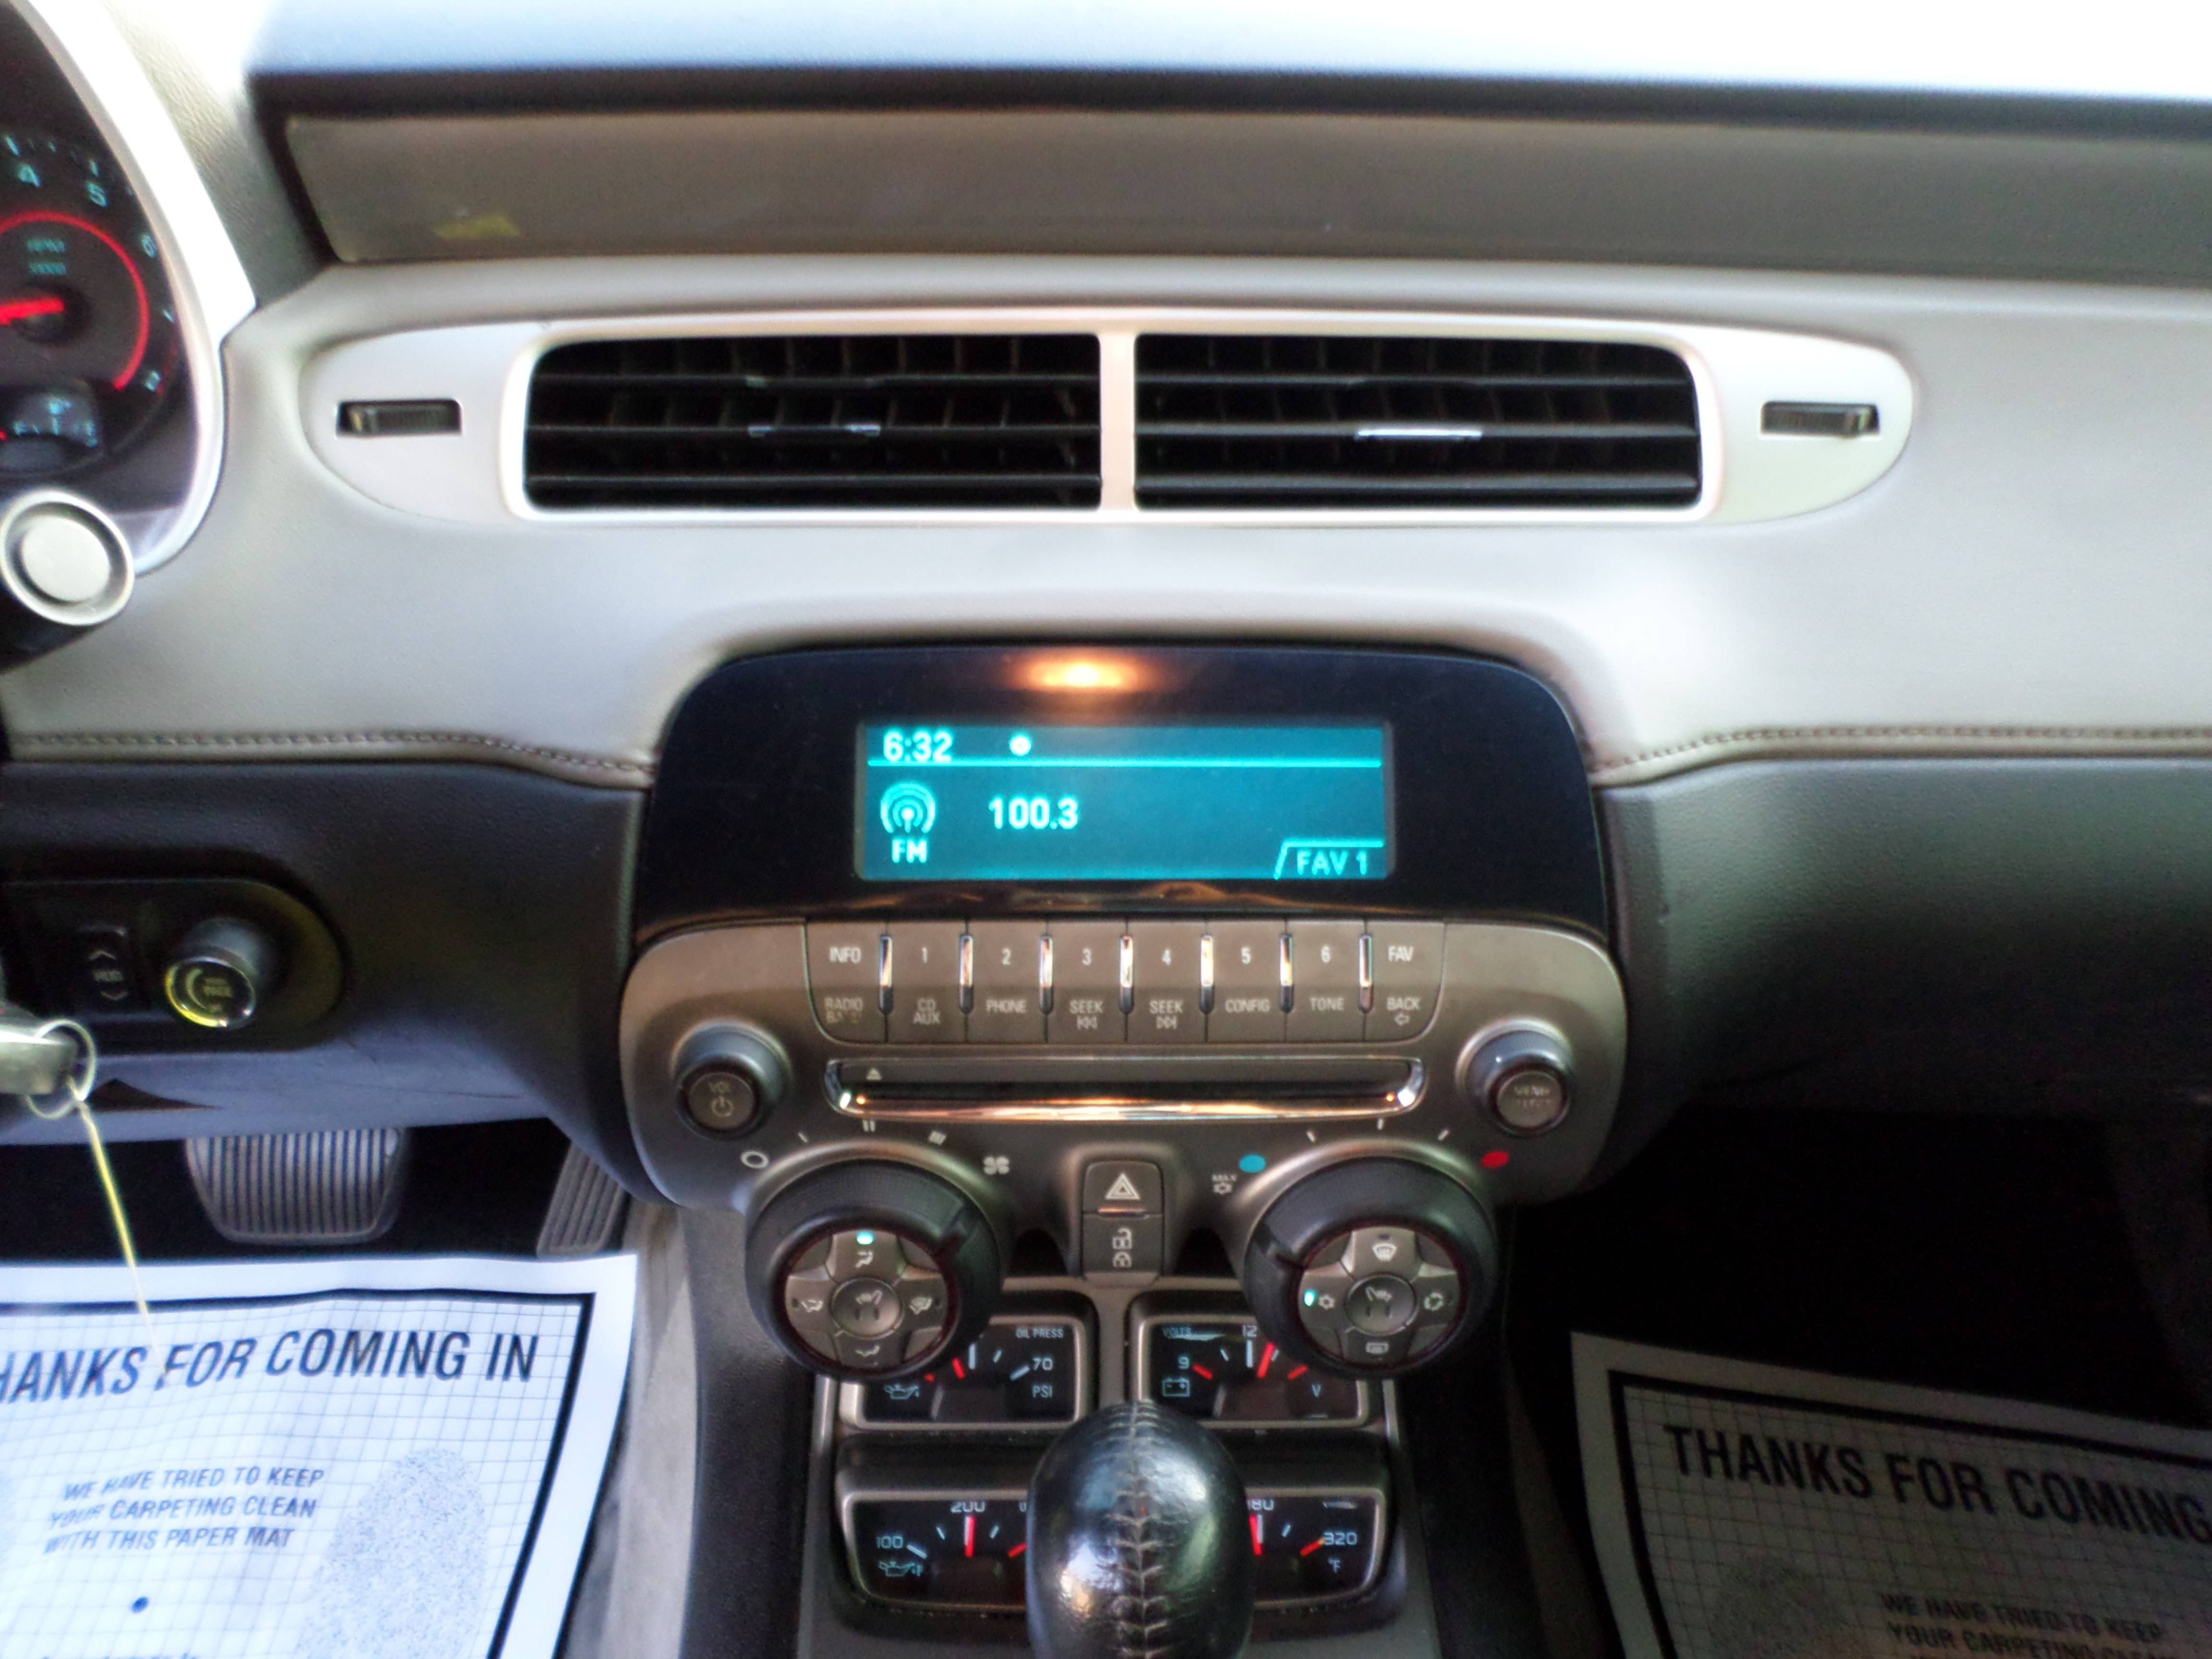 2012 Chevrolet Camaro, Convertible 2LT